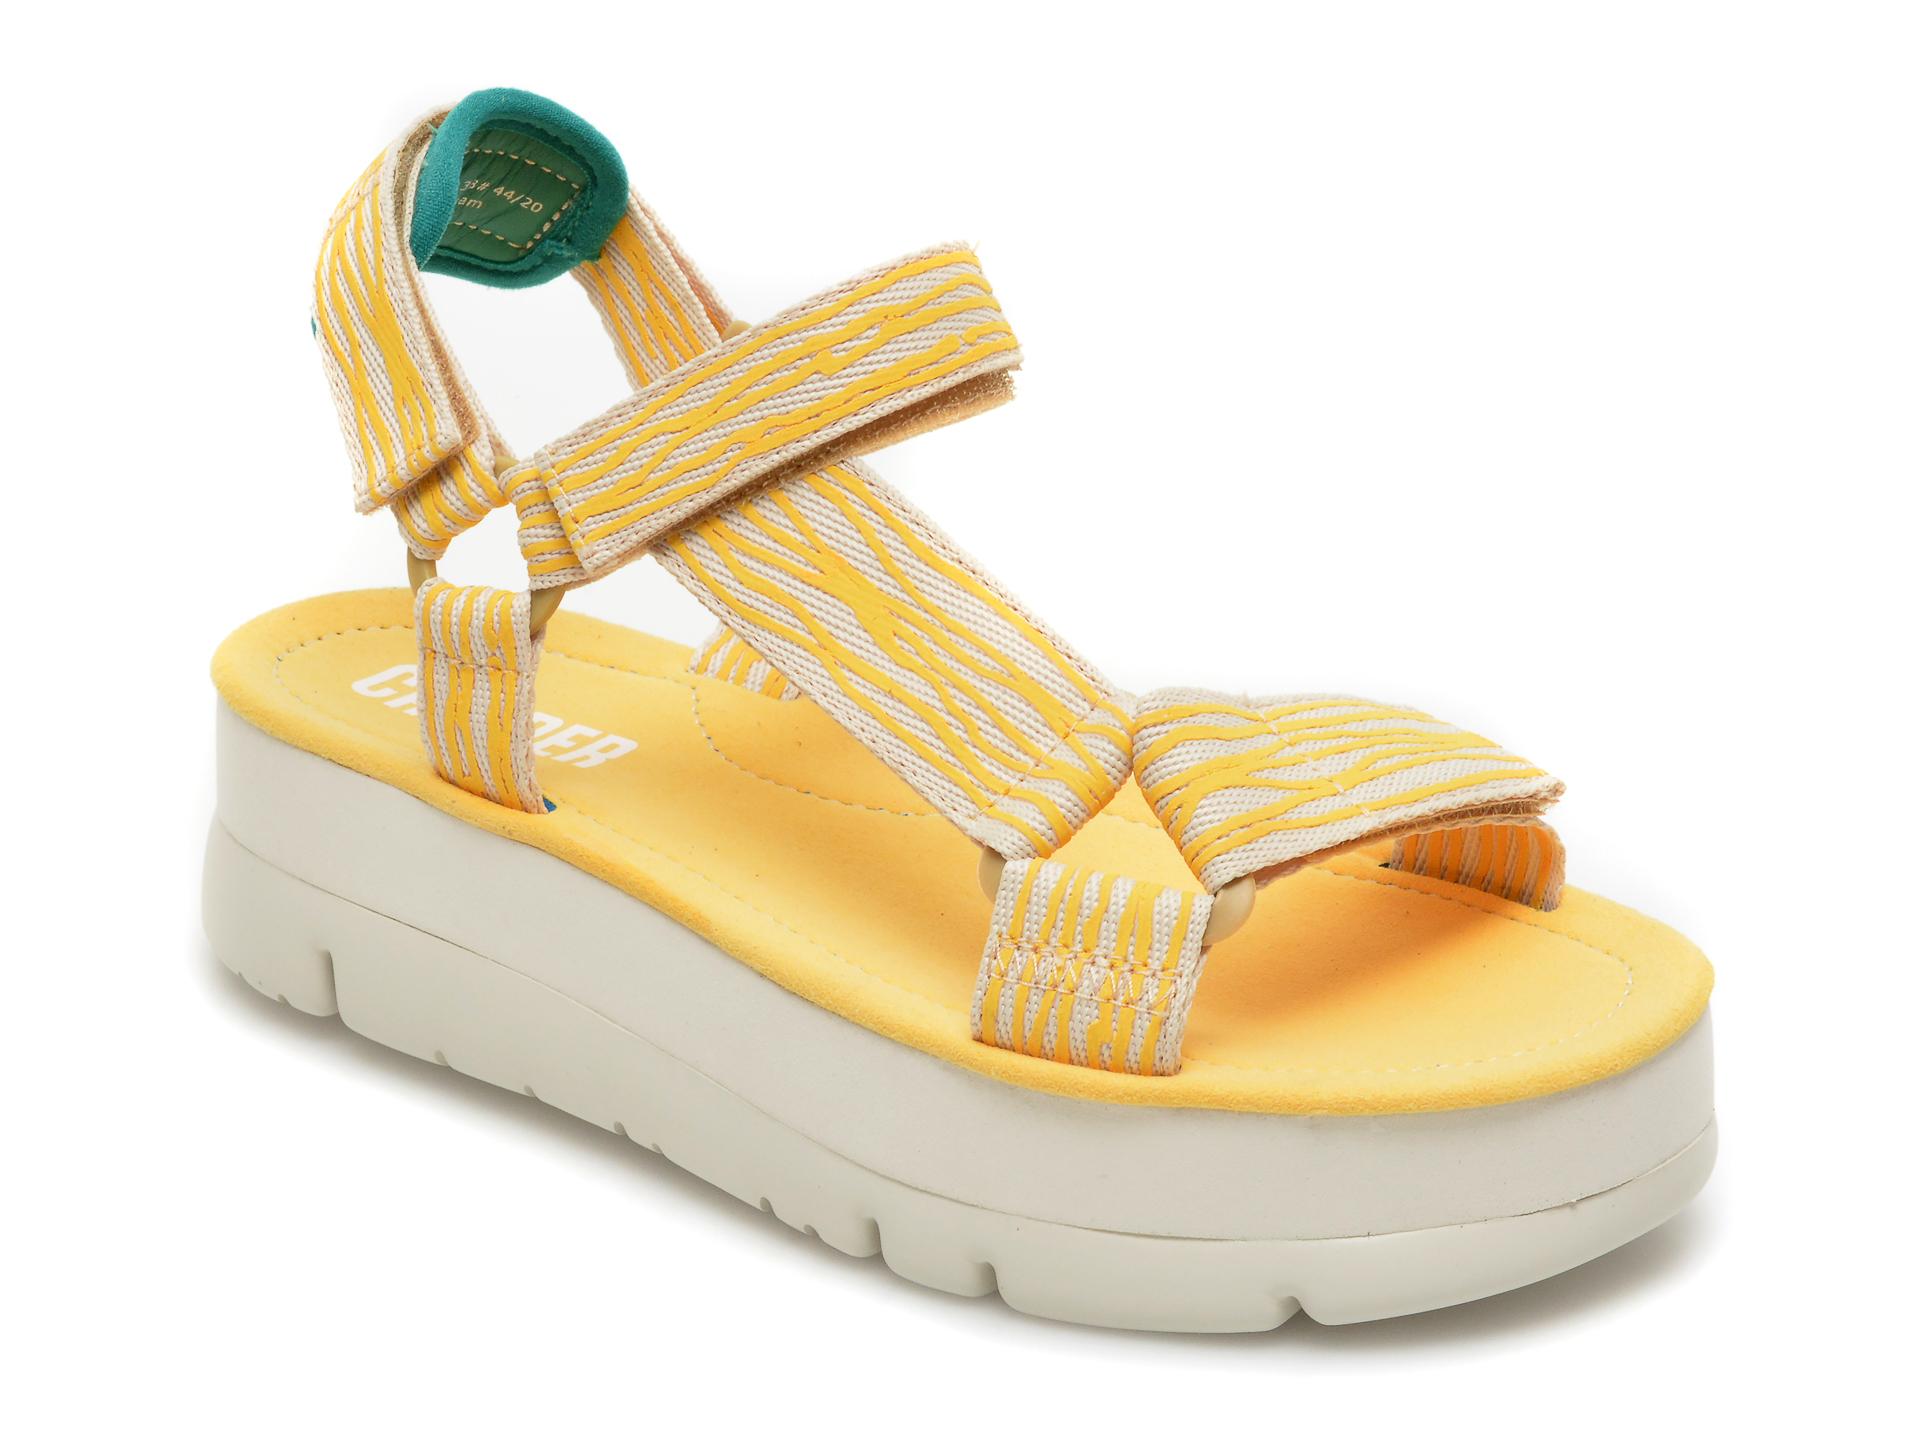 Sandale CAMPER galbene, K200851, din material textil imagine otter.ro